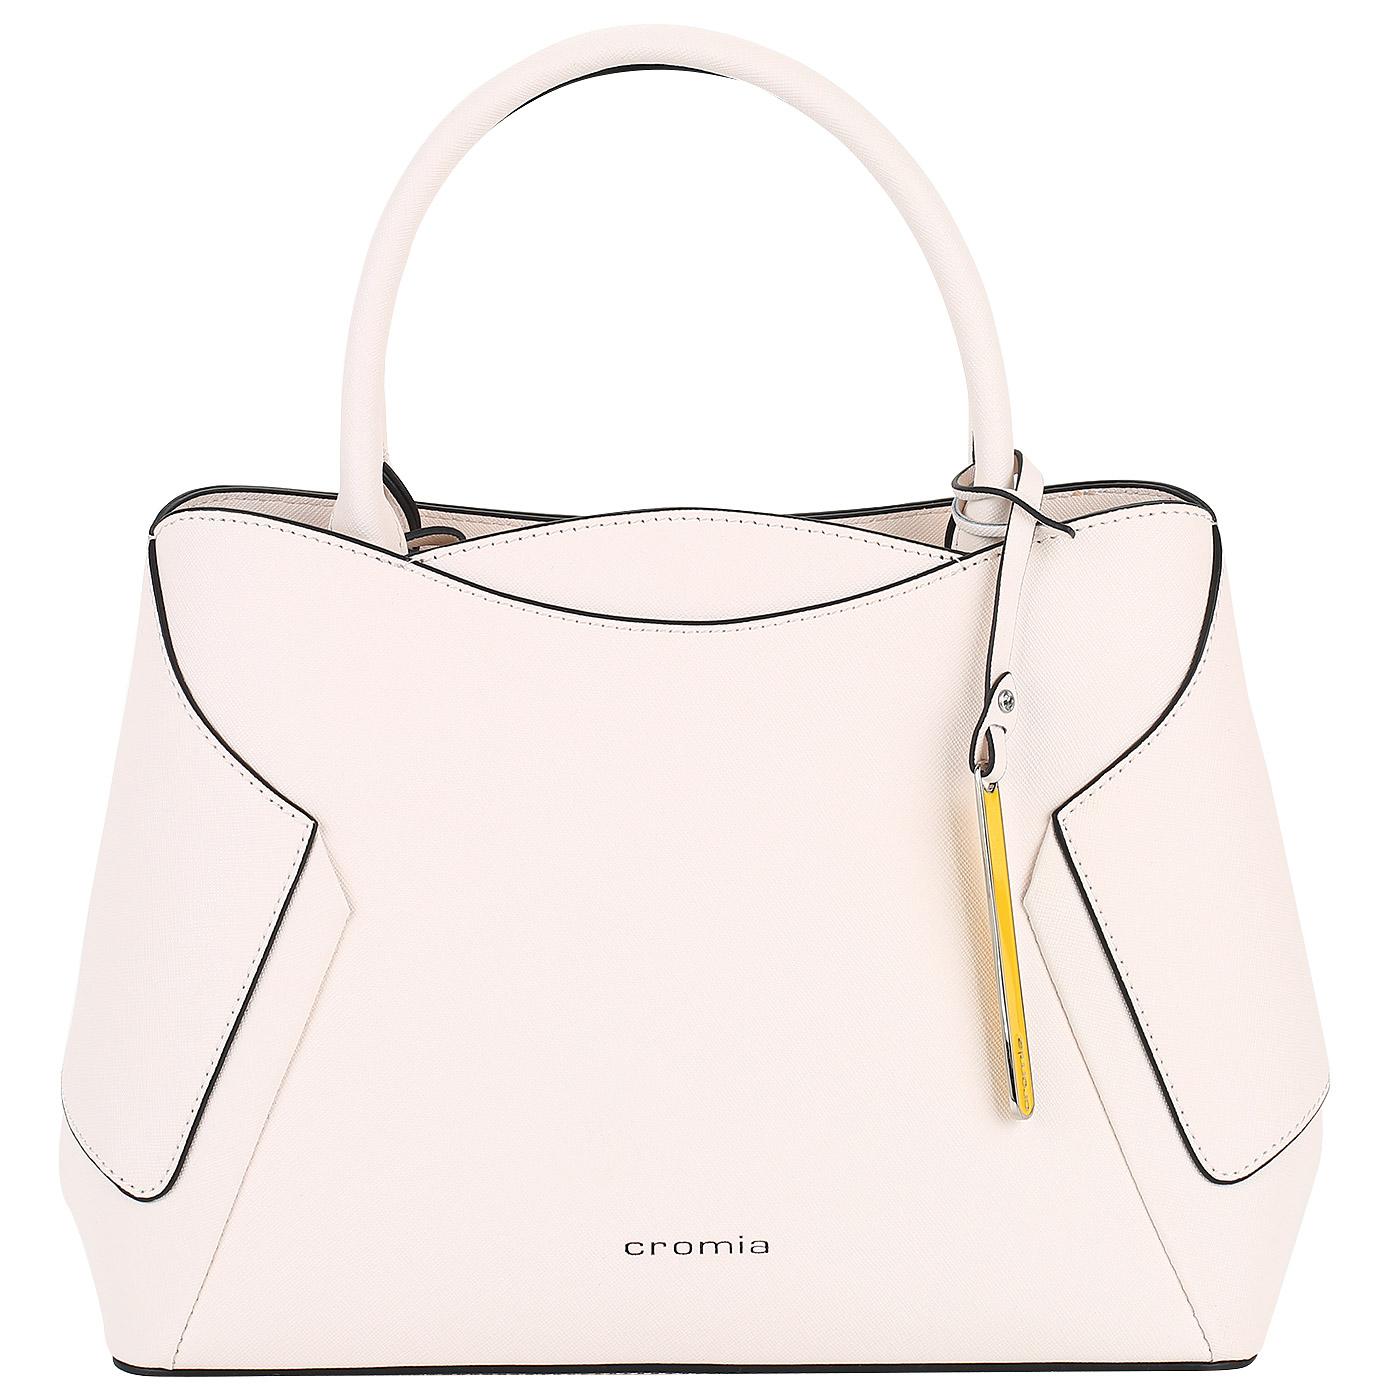 e7c9a15dfc39 Женская сумка из натурального сафьяна Cromia Wisper 1403729_beige ...